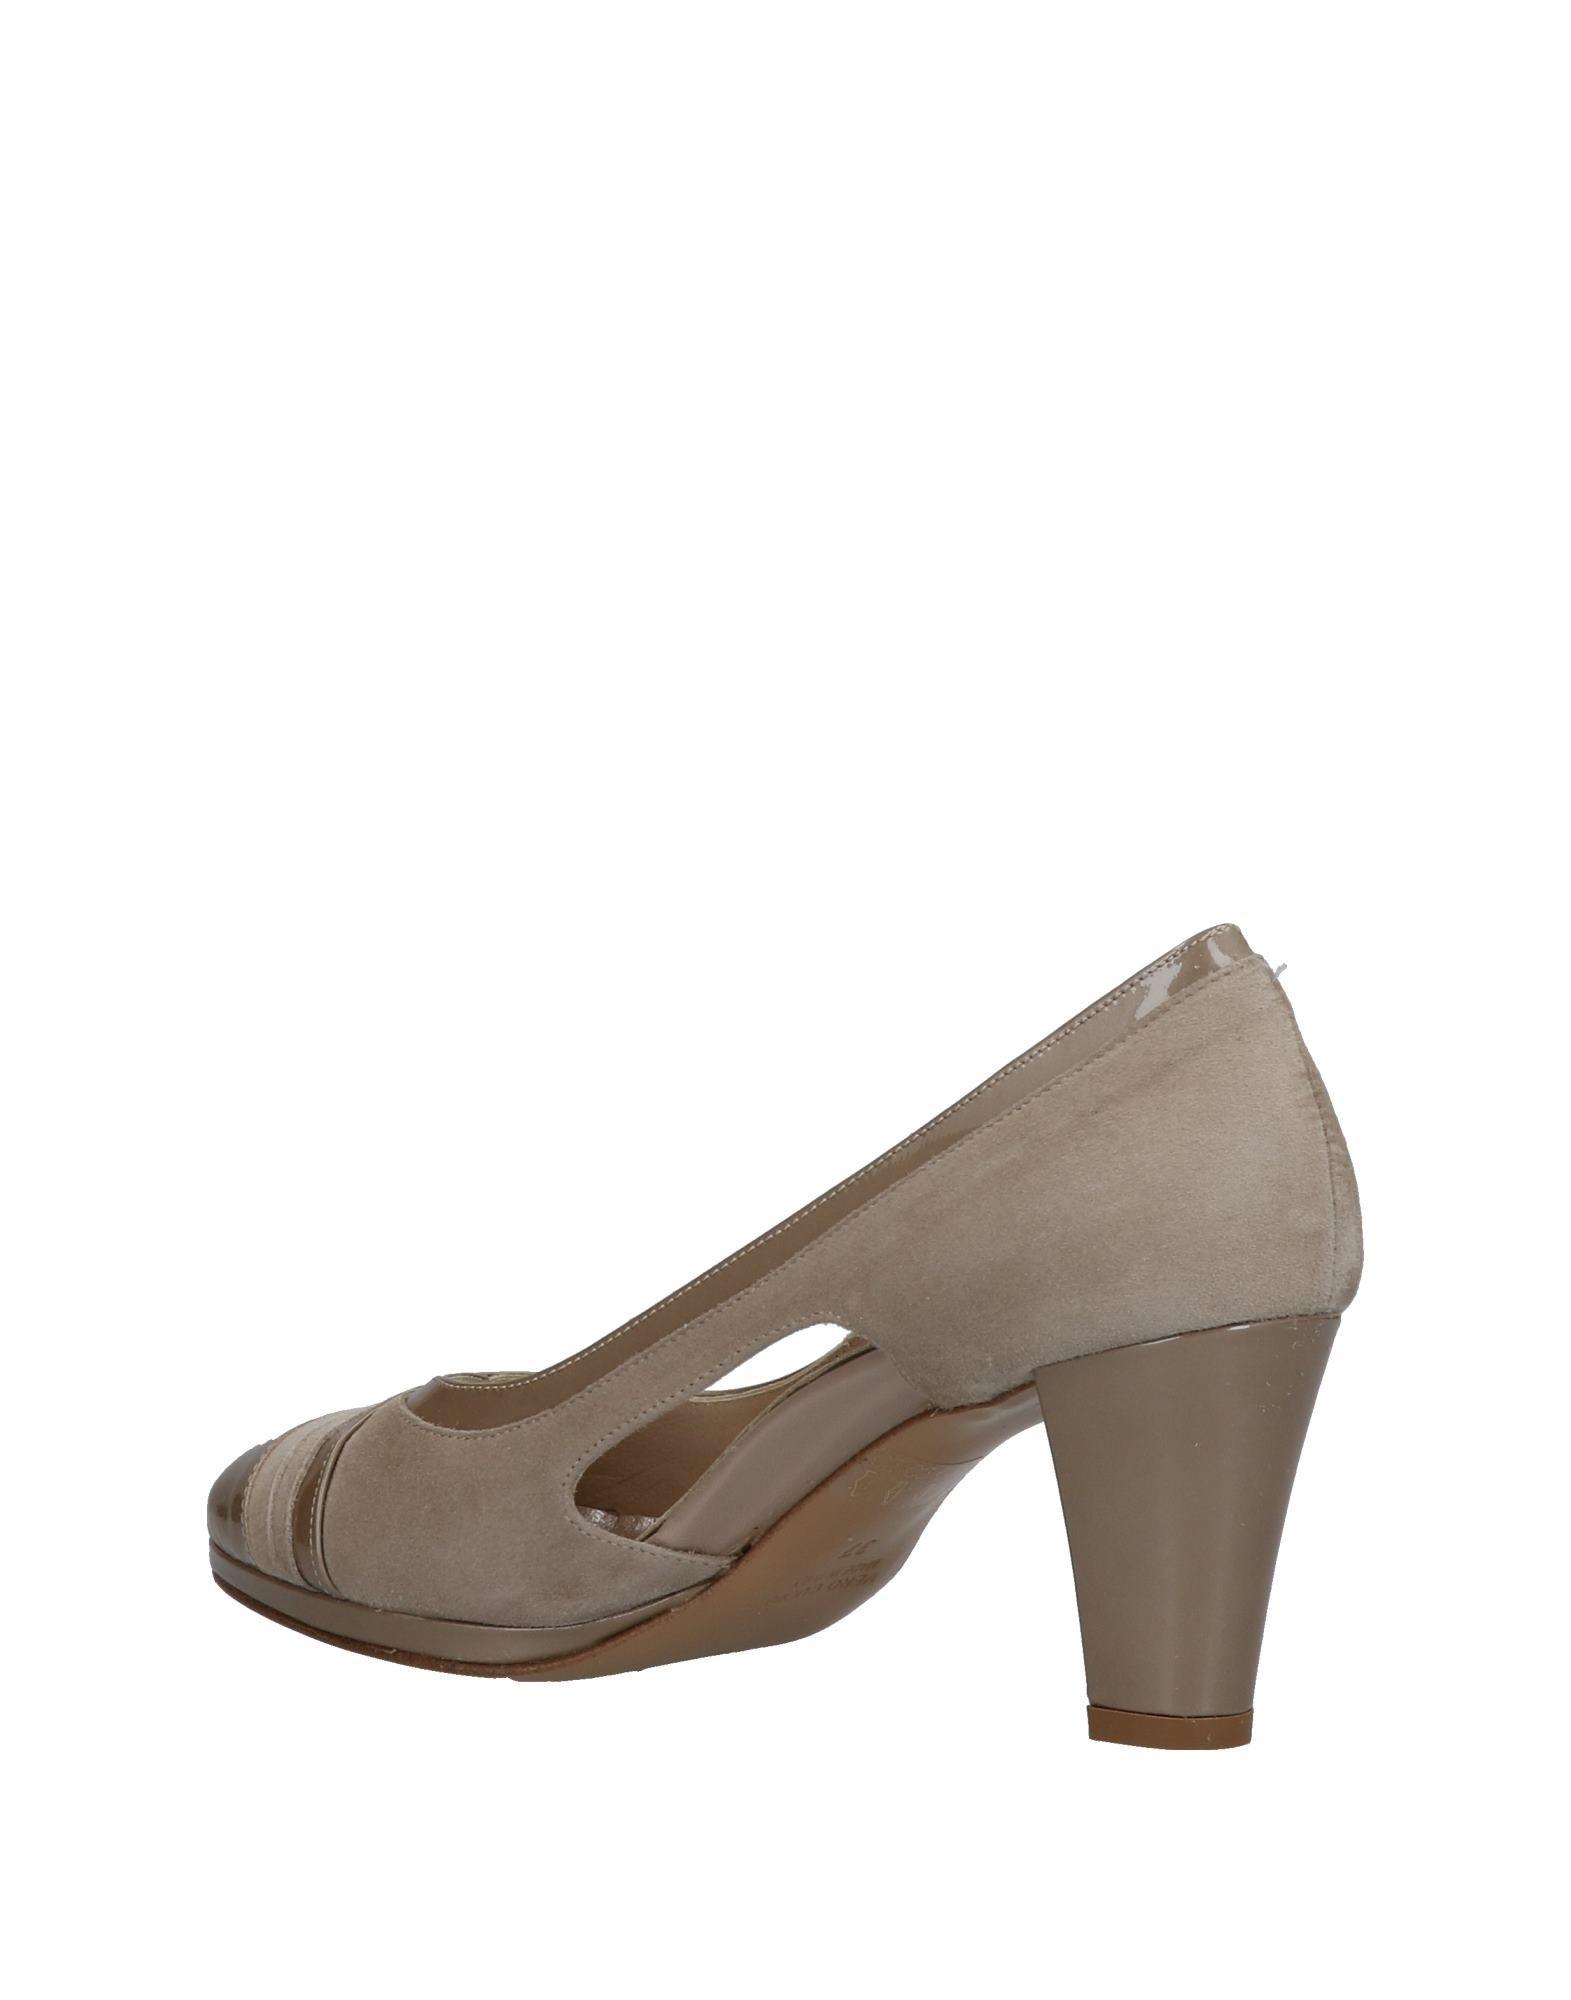 Ilario Morelli Morelli Morelli Pumps Damen 11437447GG Gute Qualität beliebte Schuhe 9fcbcf